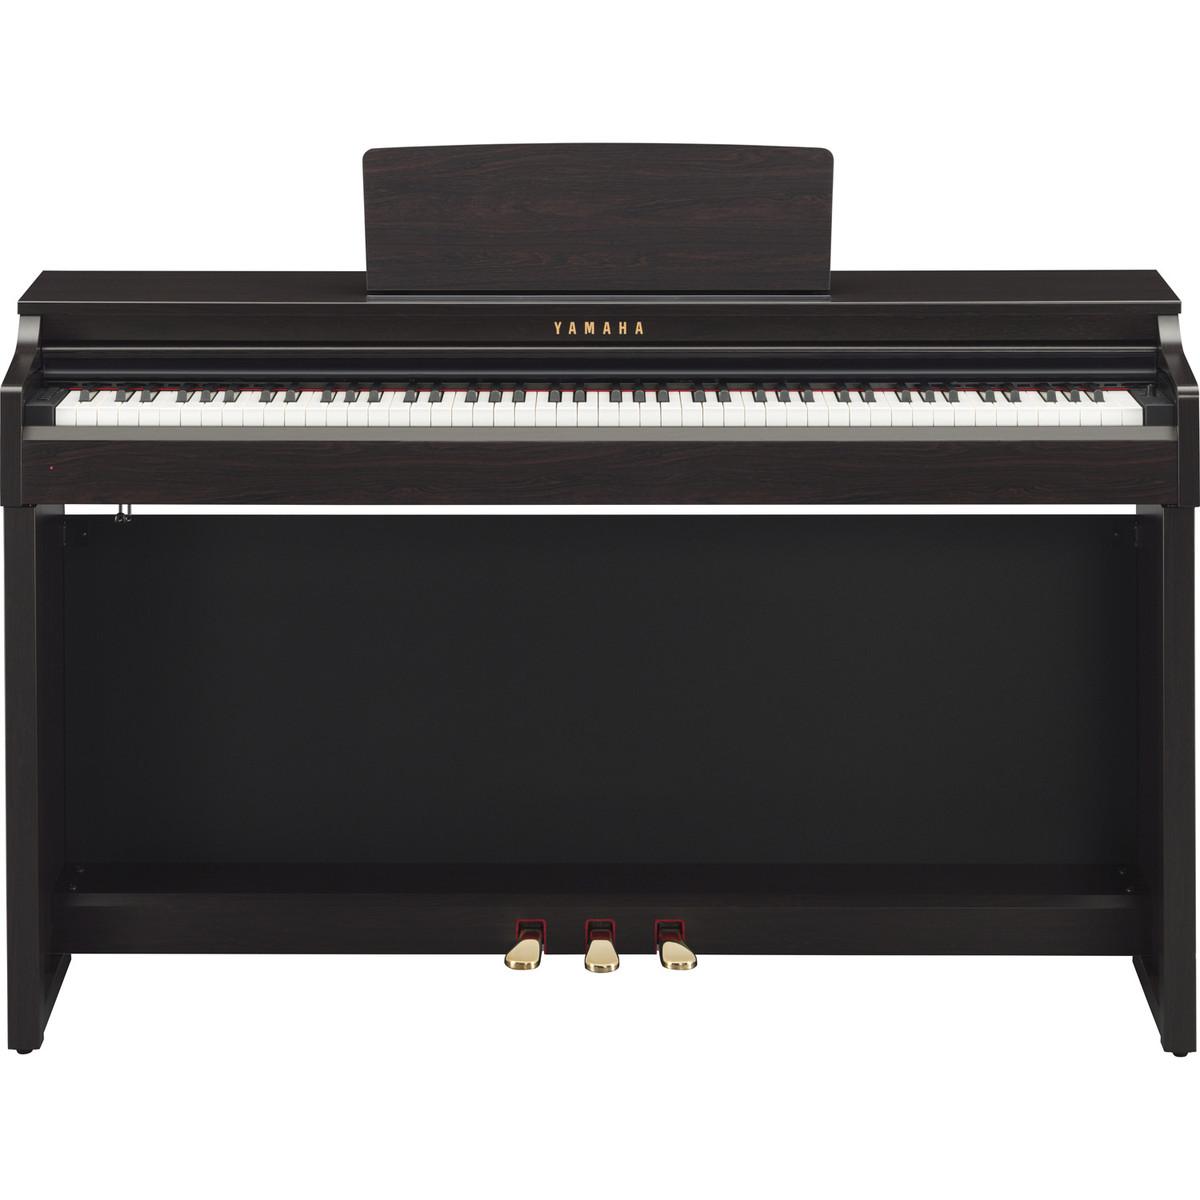 Yamaha clavinova clp525 digital piano rosewood at for Digital piano keyboard yamaha